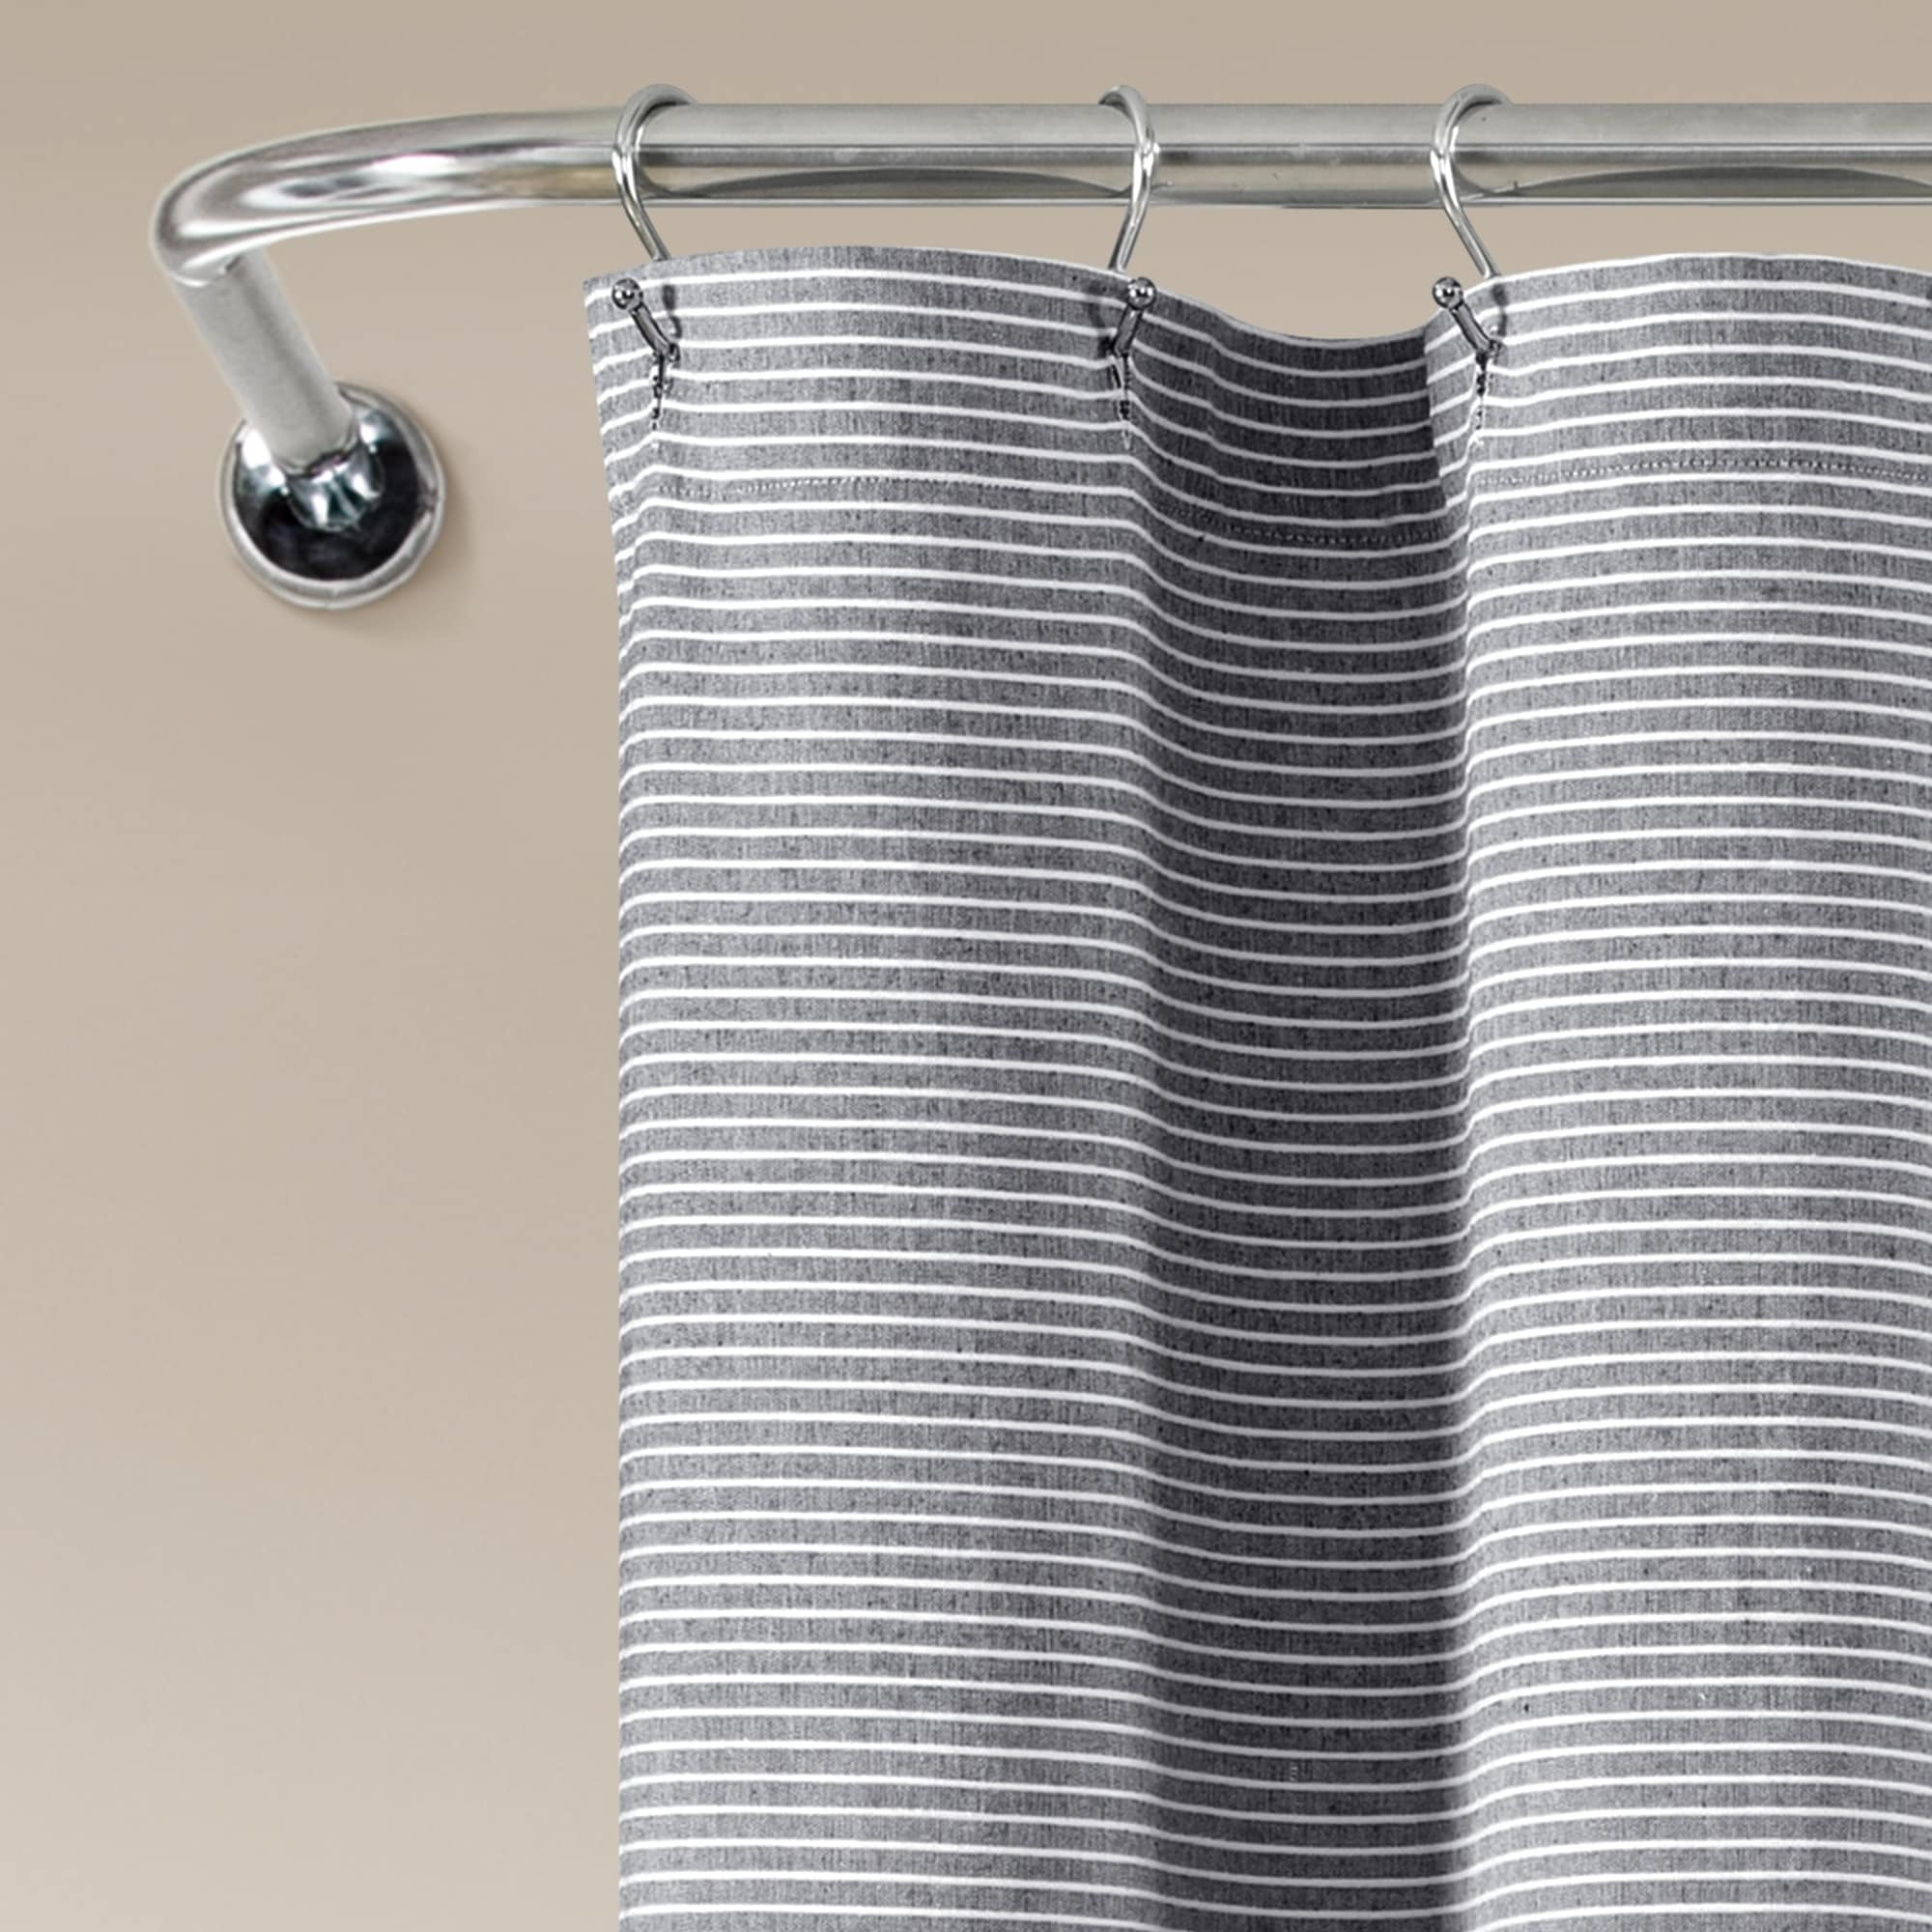 Lush Decor Farmhouse Button Stripe Yarn Dyed Woven Cotton Shower Curtain On Sale Overstock 31272492 Linen